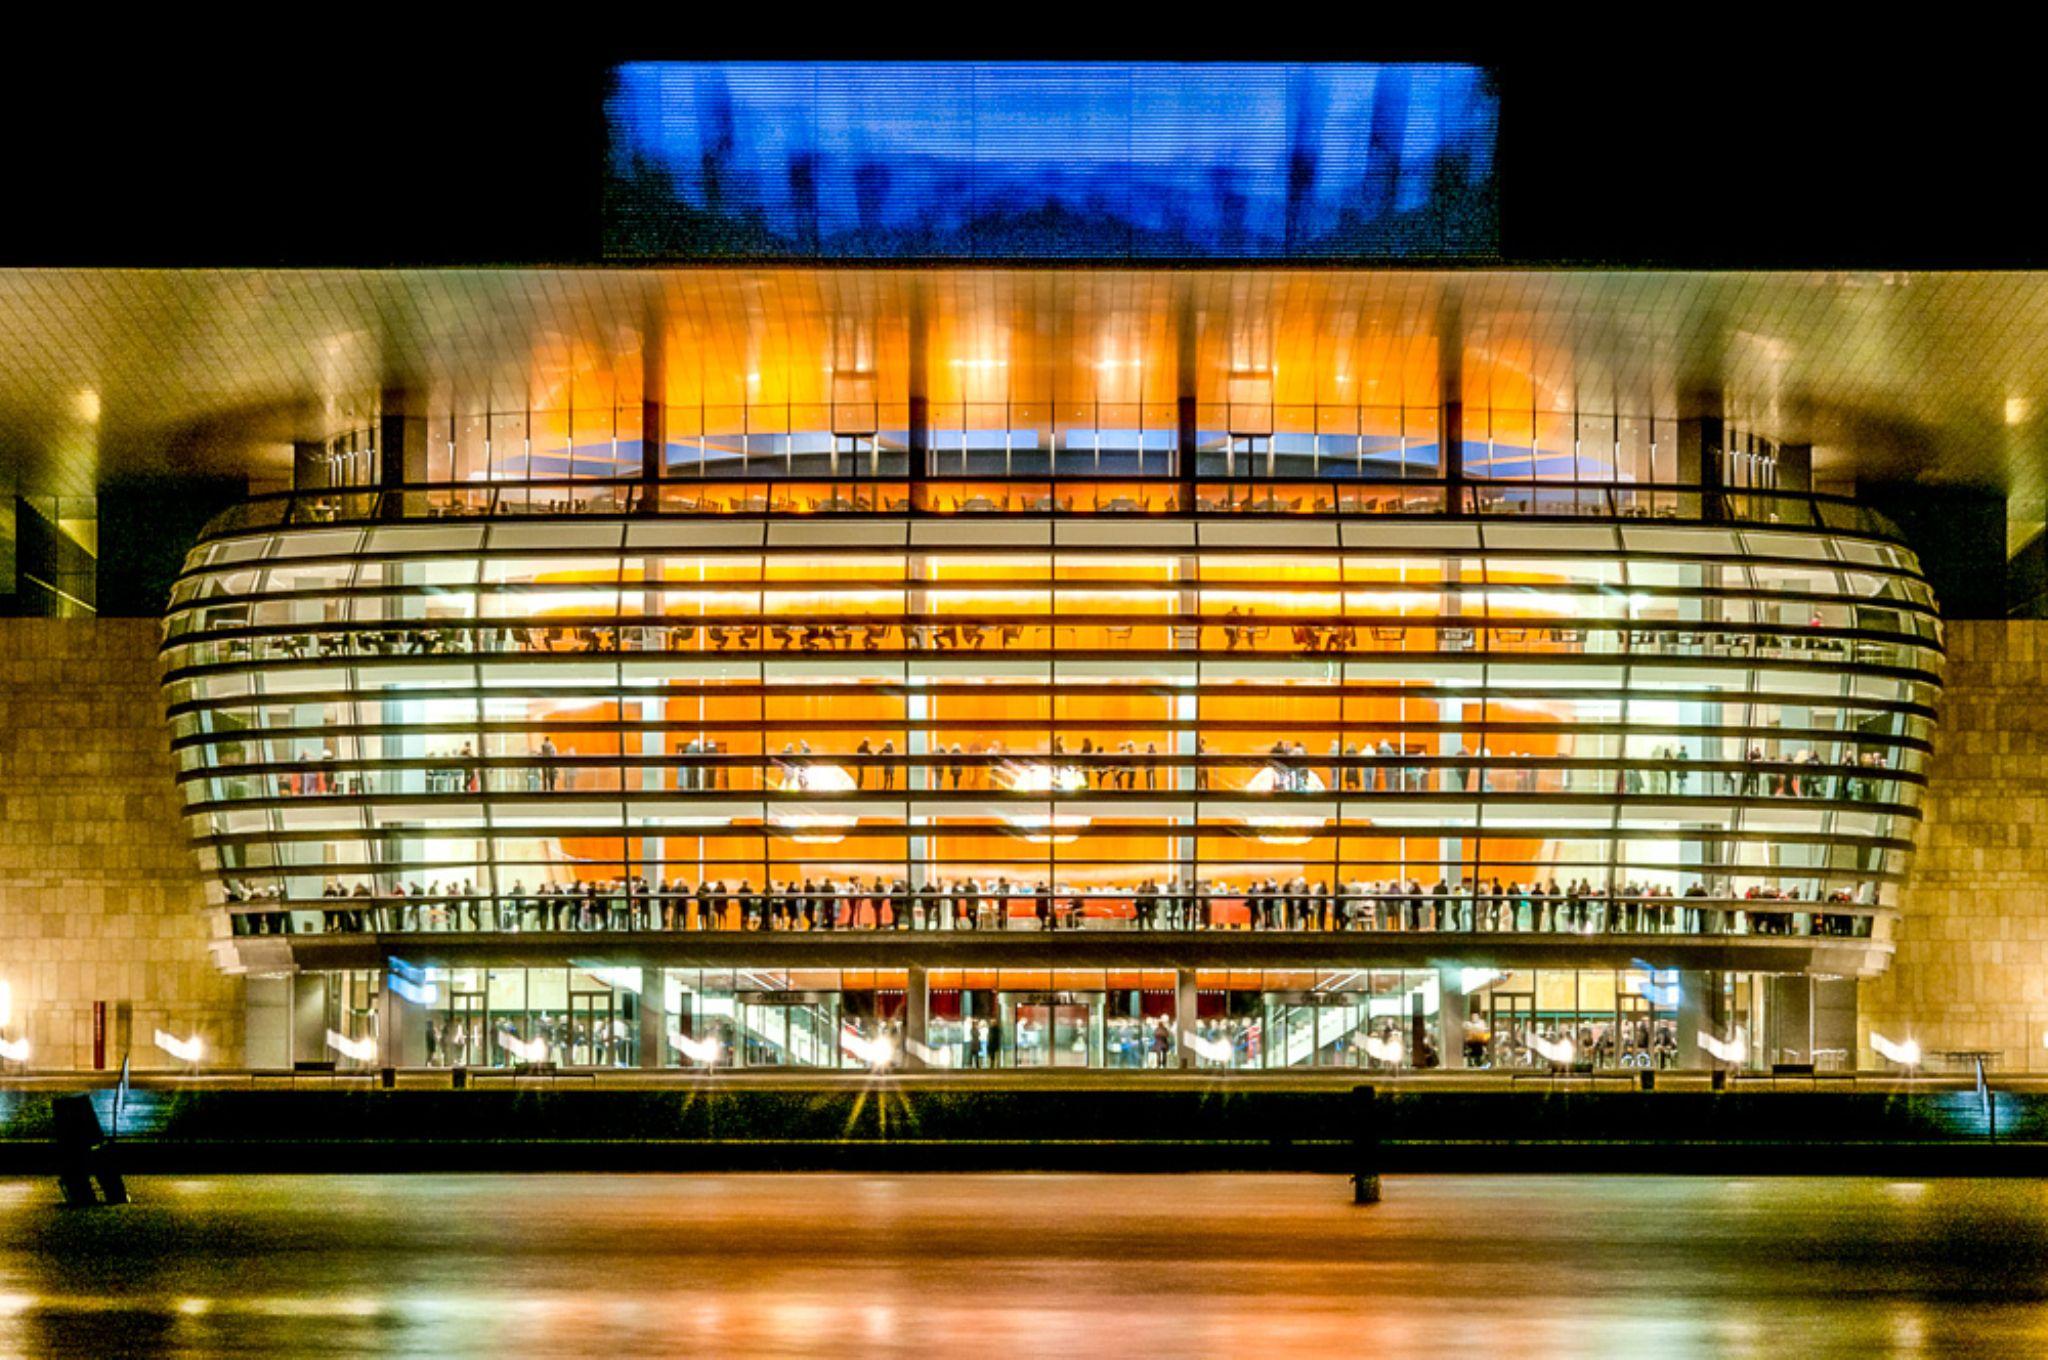 Opera house at break by michaelinitaly